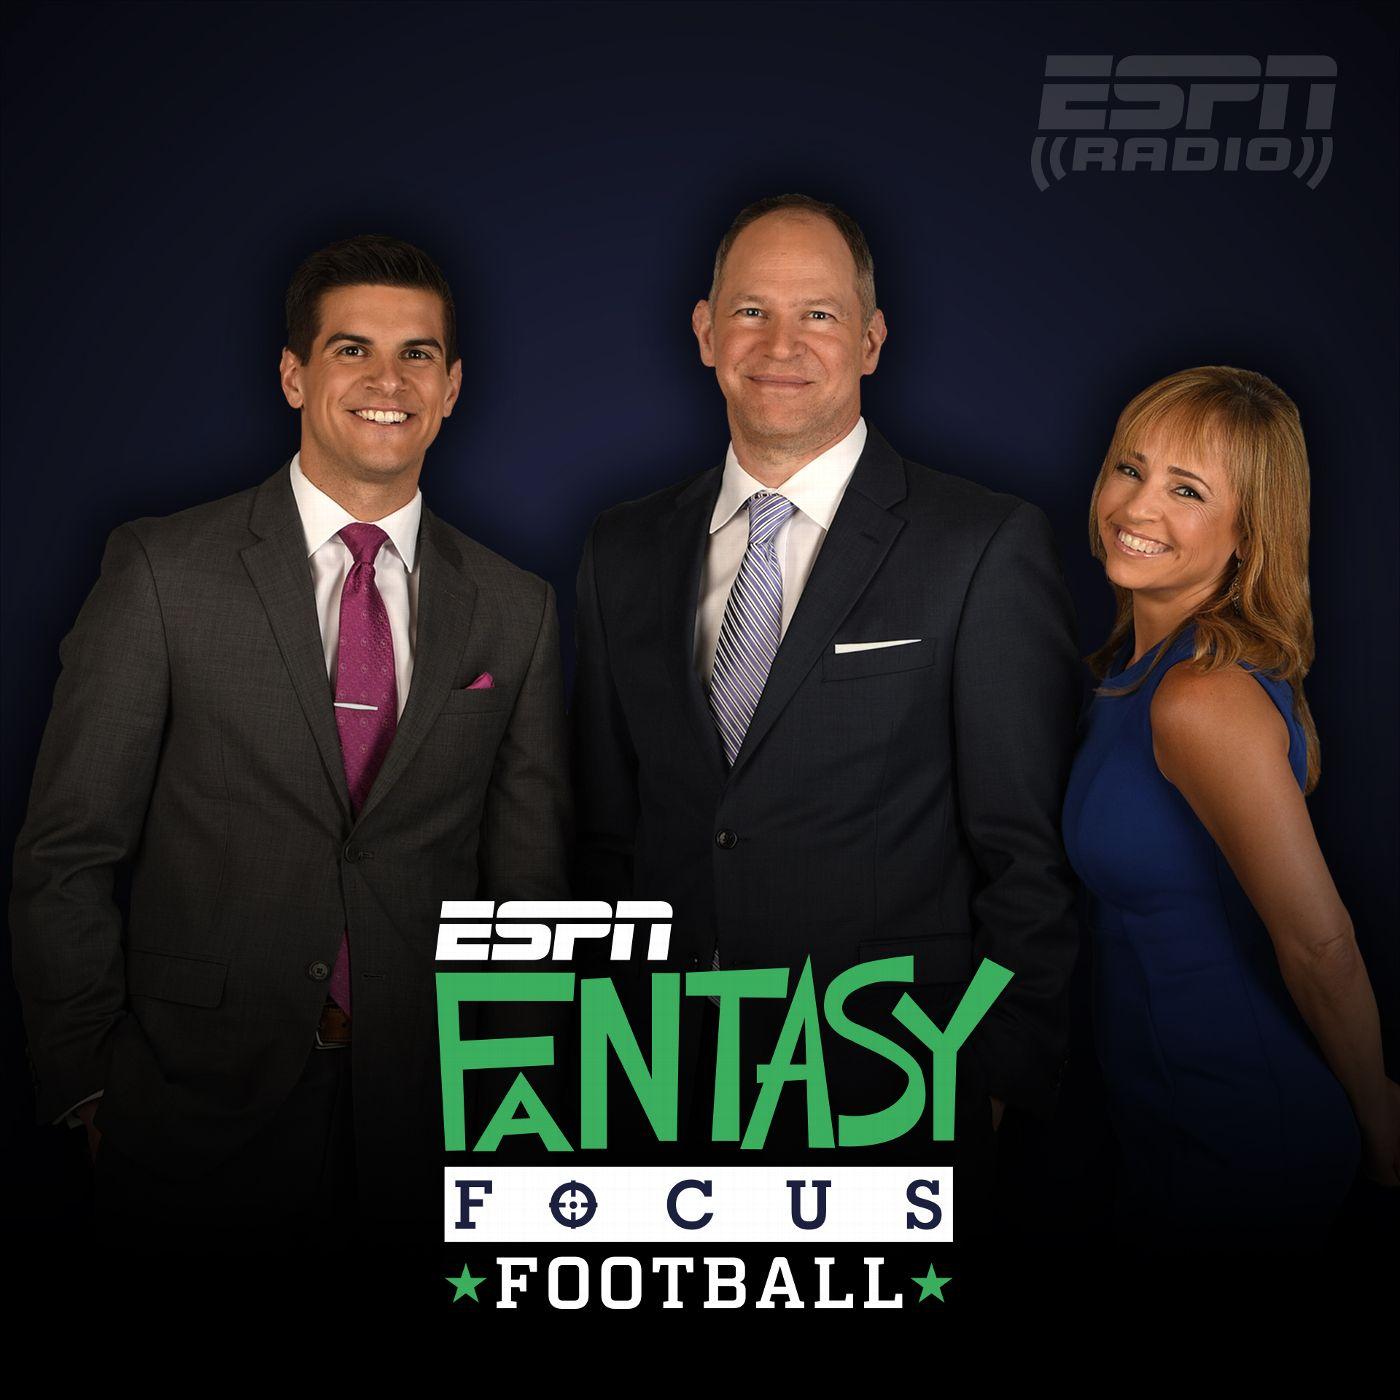 Fantasy Focus Football Listen Via Stitcher Radio On Demand